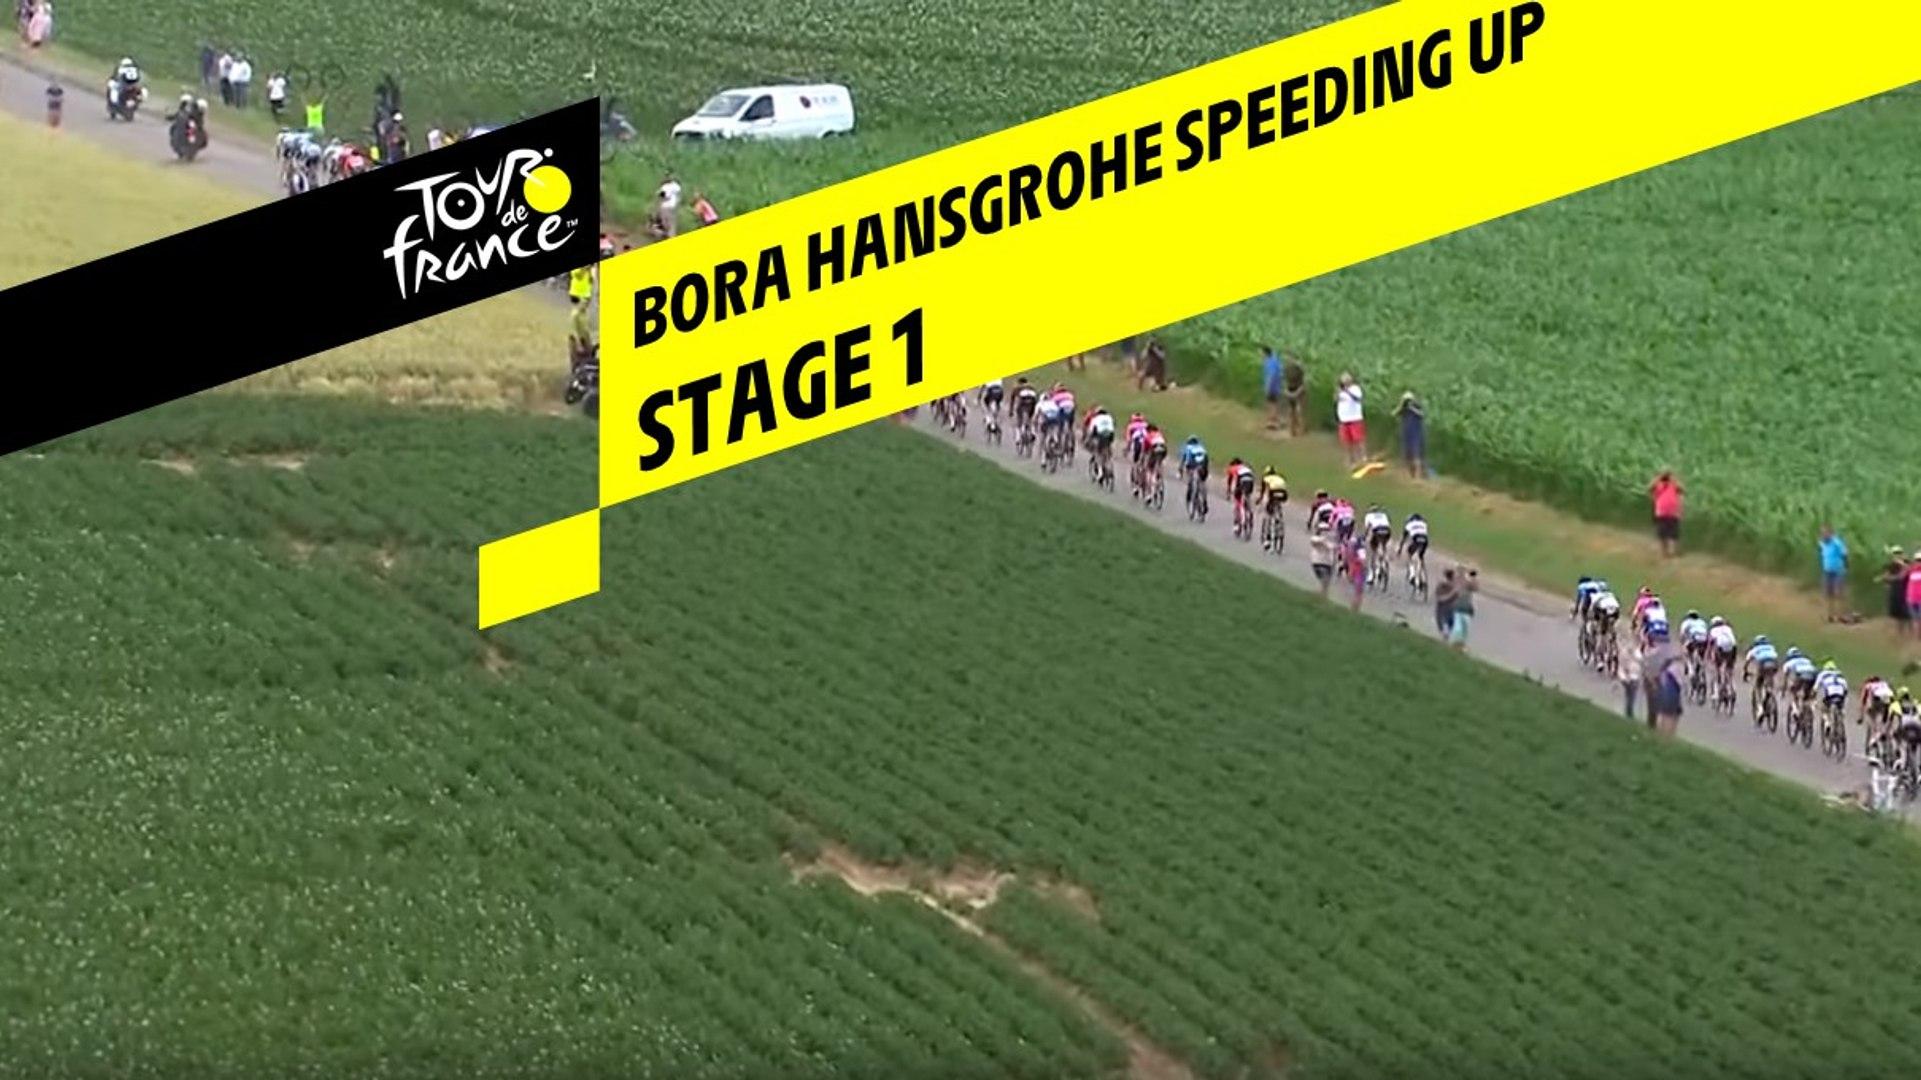 Bora Hansgrohe accélère / Bora Hansgrohe speeding up - Etape 1 / Stage 1 - Tour de France 2019